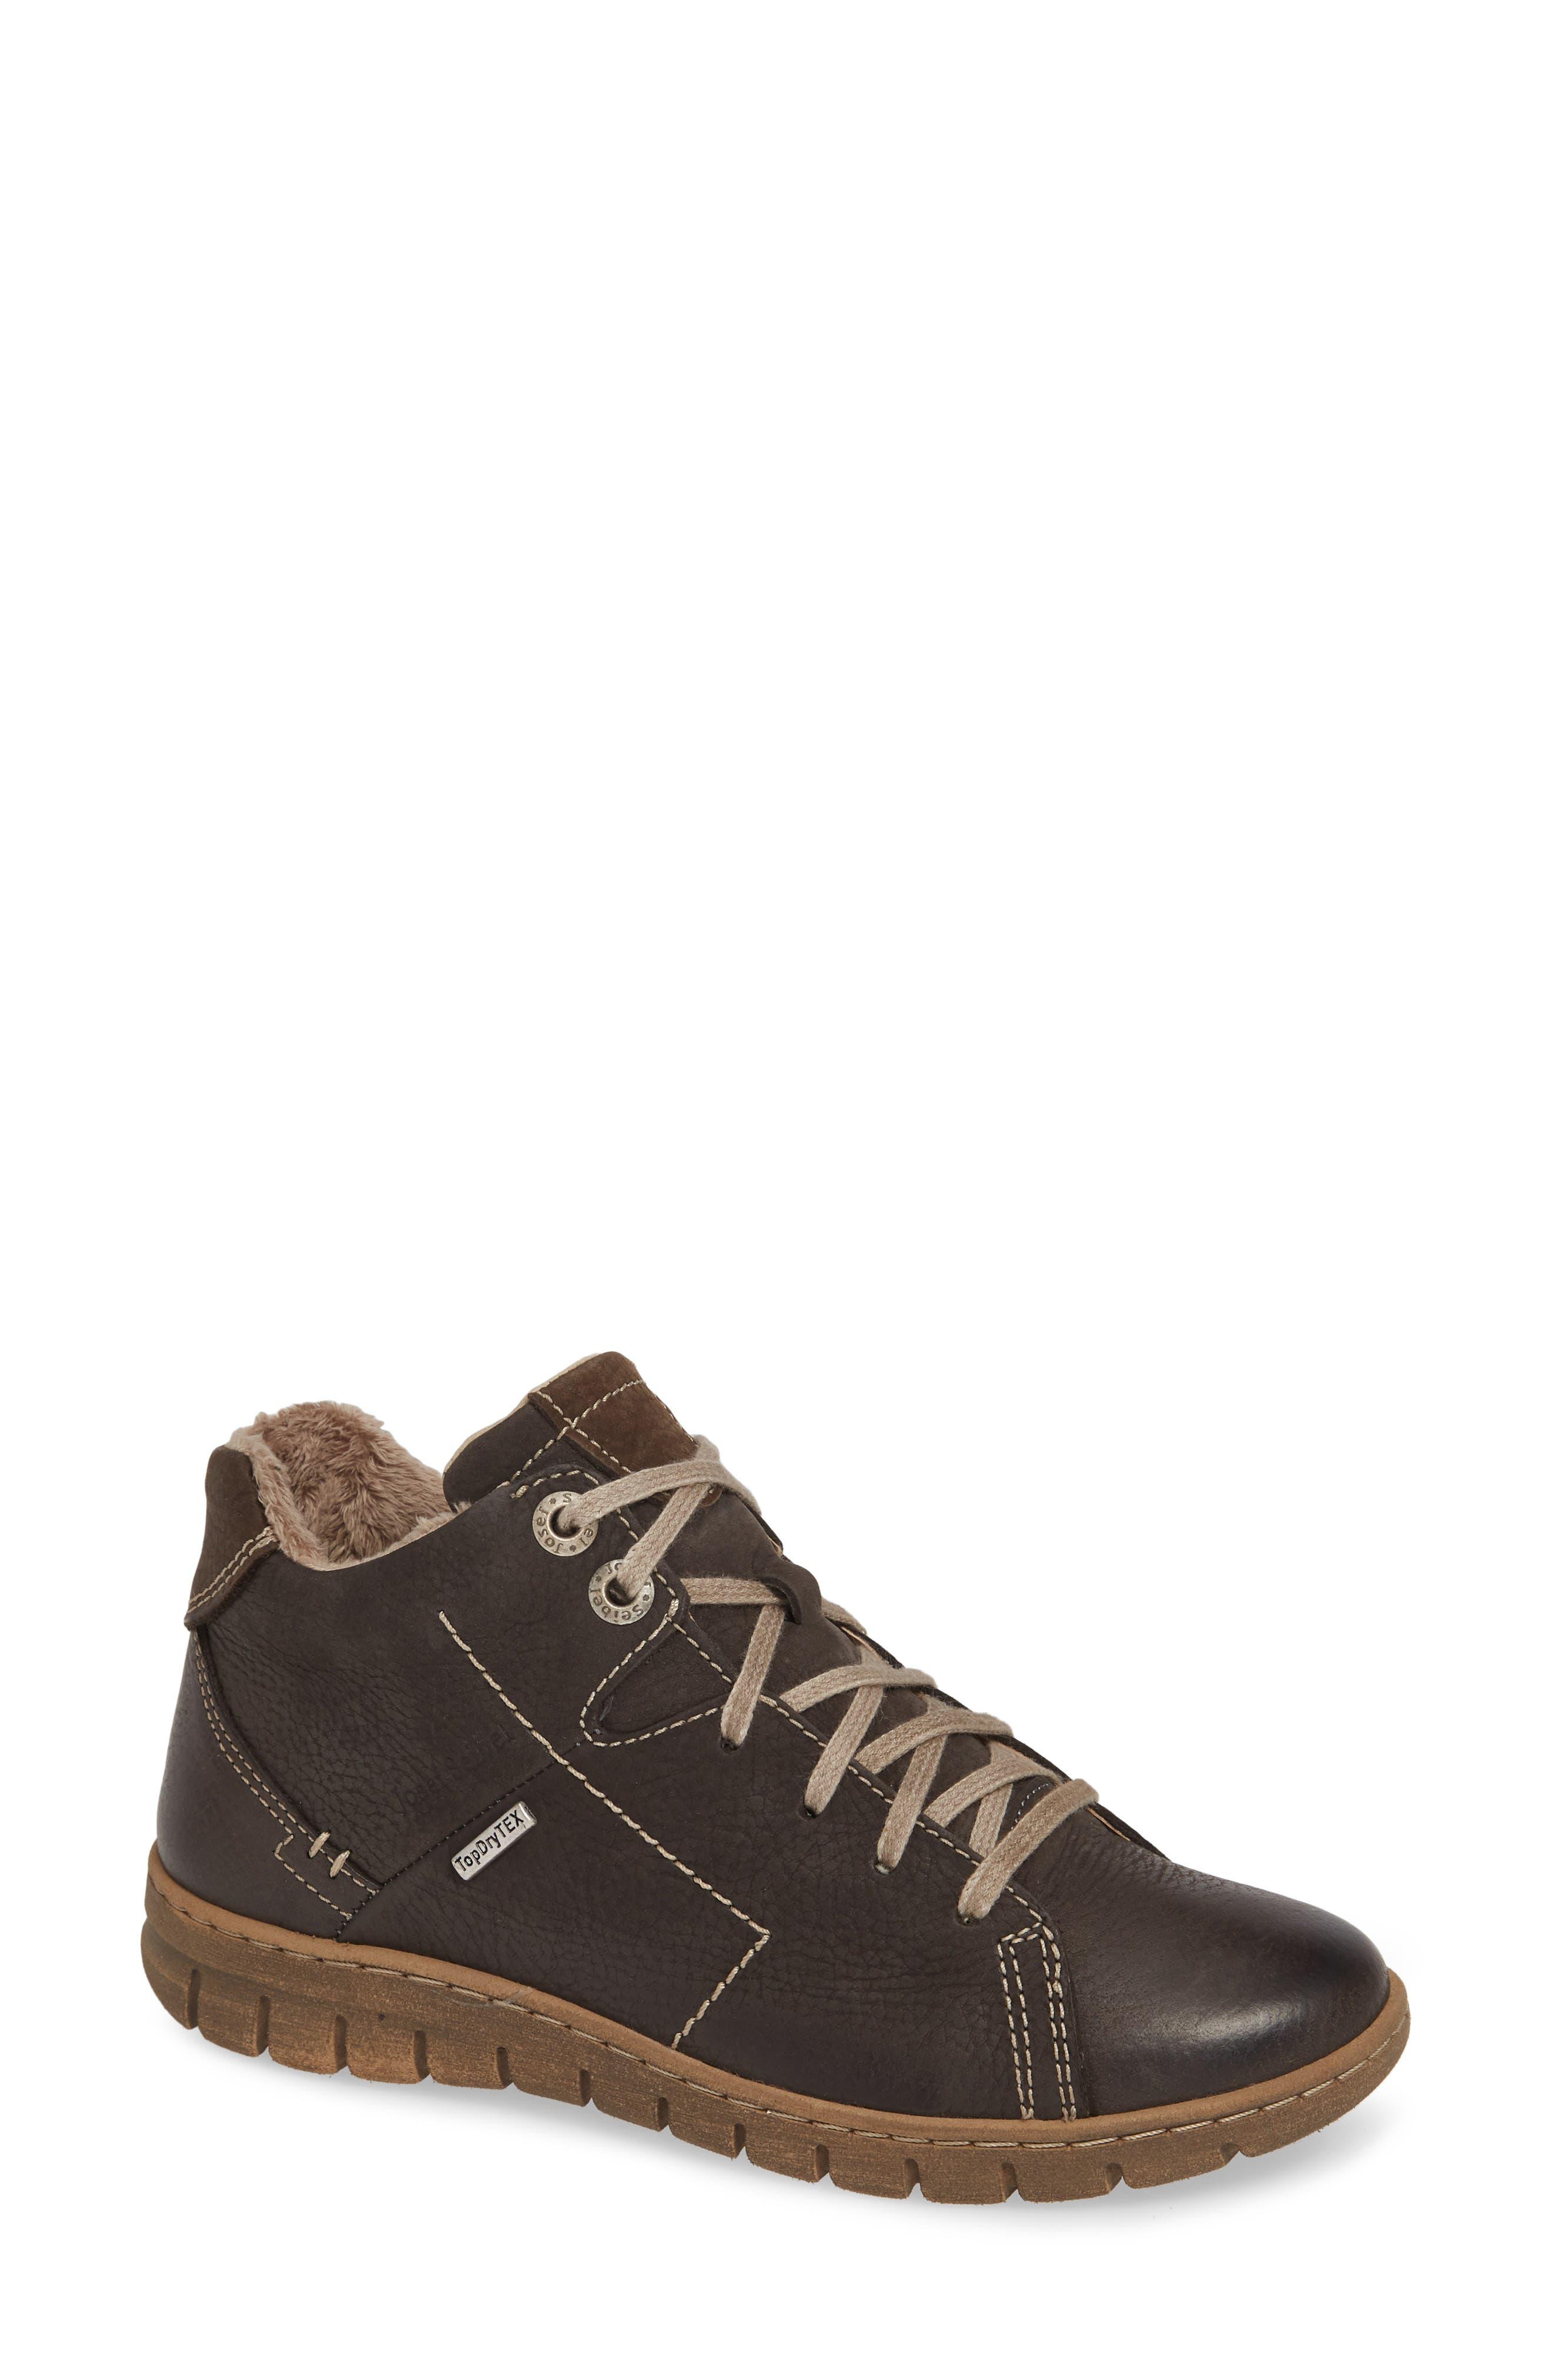 Steffi 58 Sneaker Bootie,                             Main thumbnail 1, color,                             TITAN LEATHER